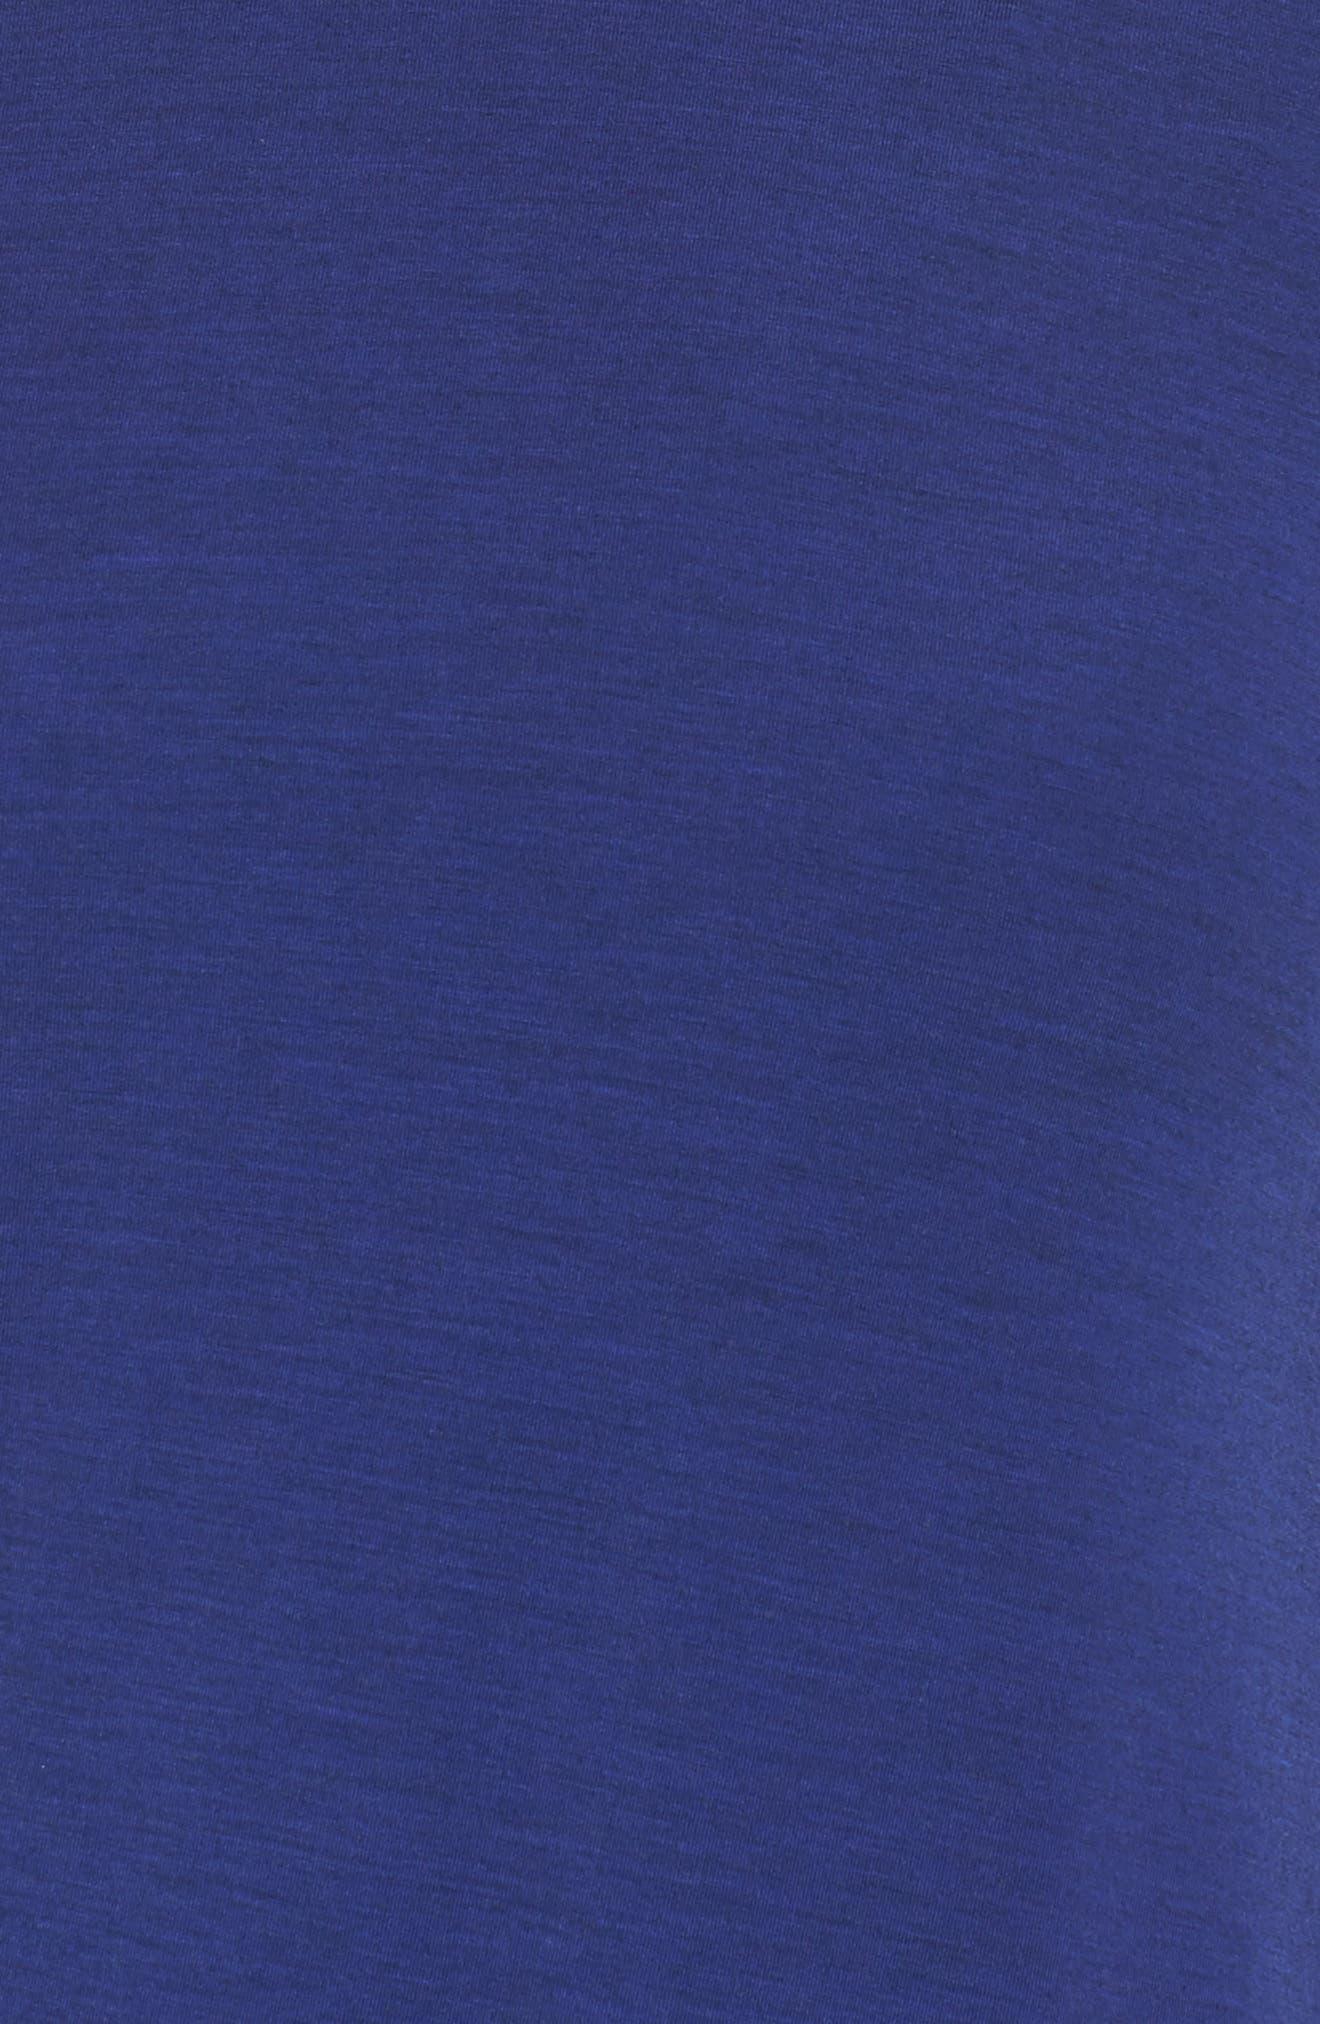 Long Sleeve Layering Tee,                             Alternate thumbnail 6, color,                             402